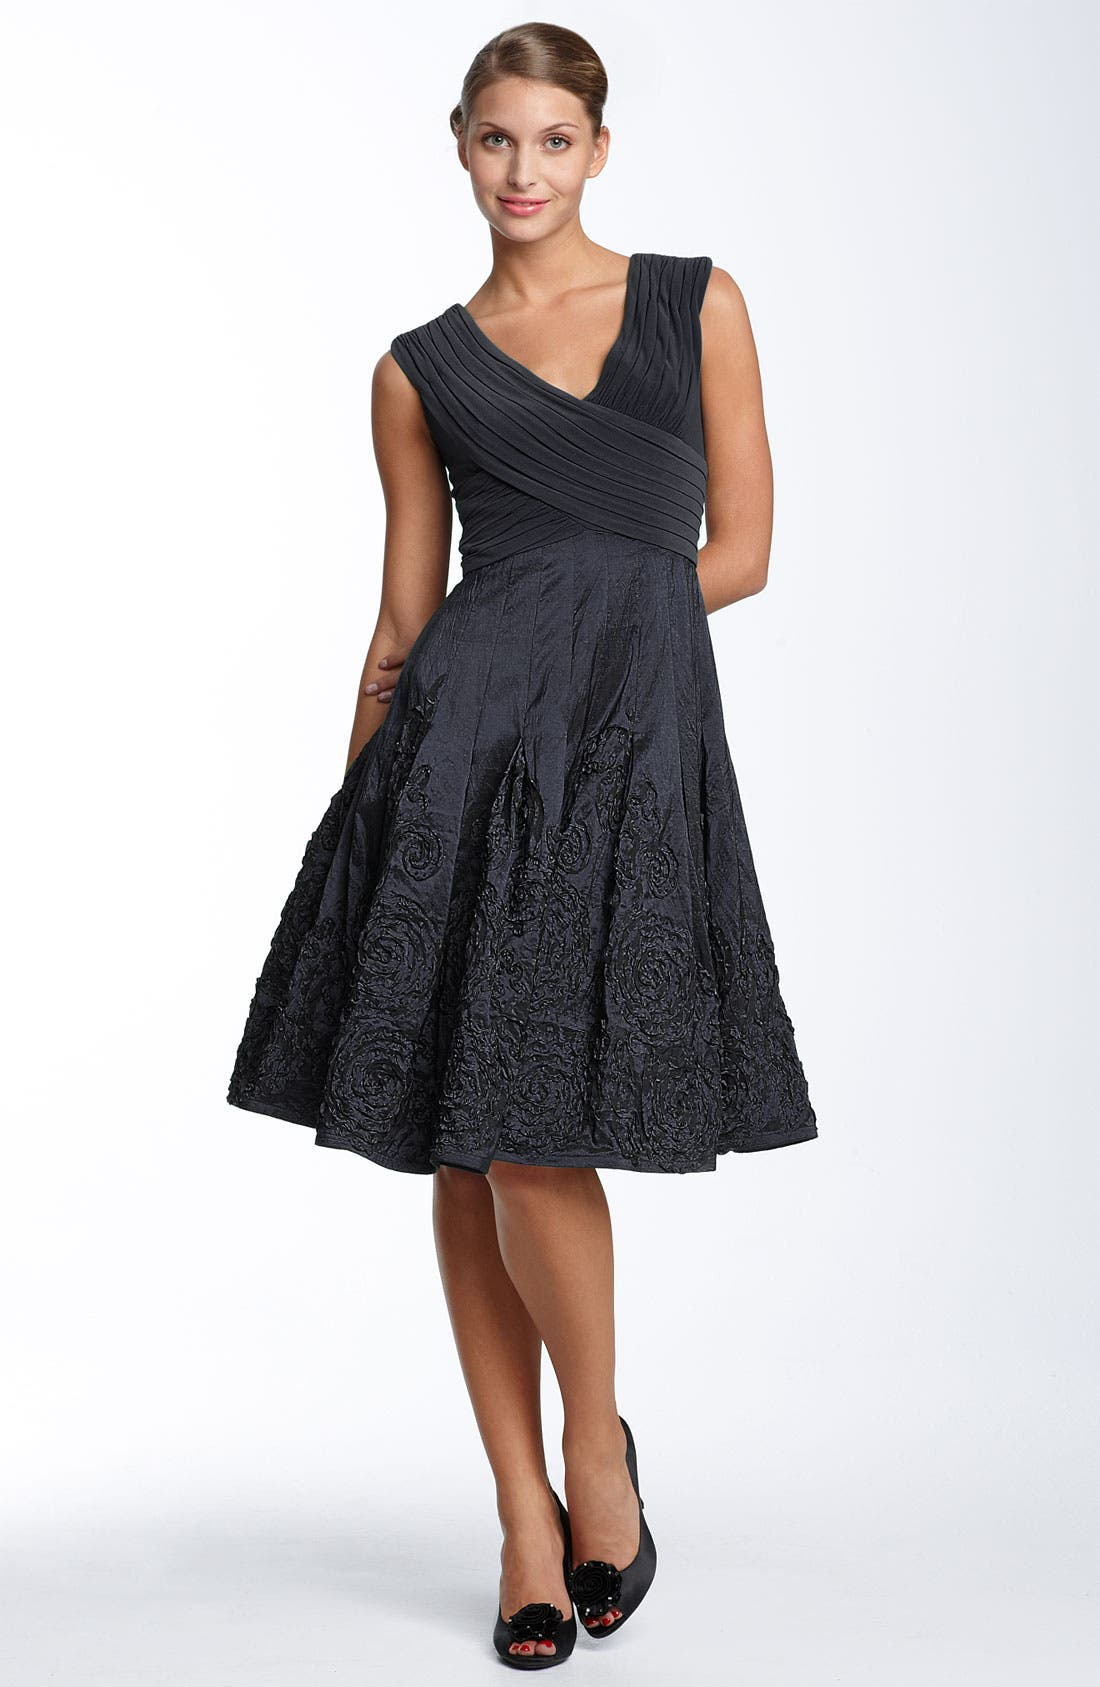 Alternate Image 1 Selected - Adrianna Papell Matte Jersey & Taffeta Dress (Regular & Petite)